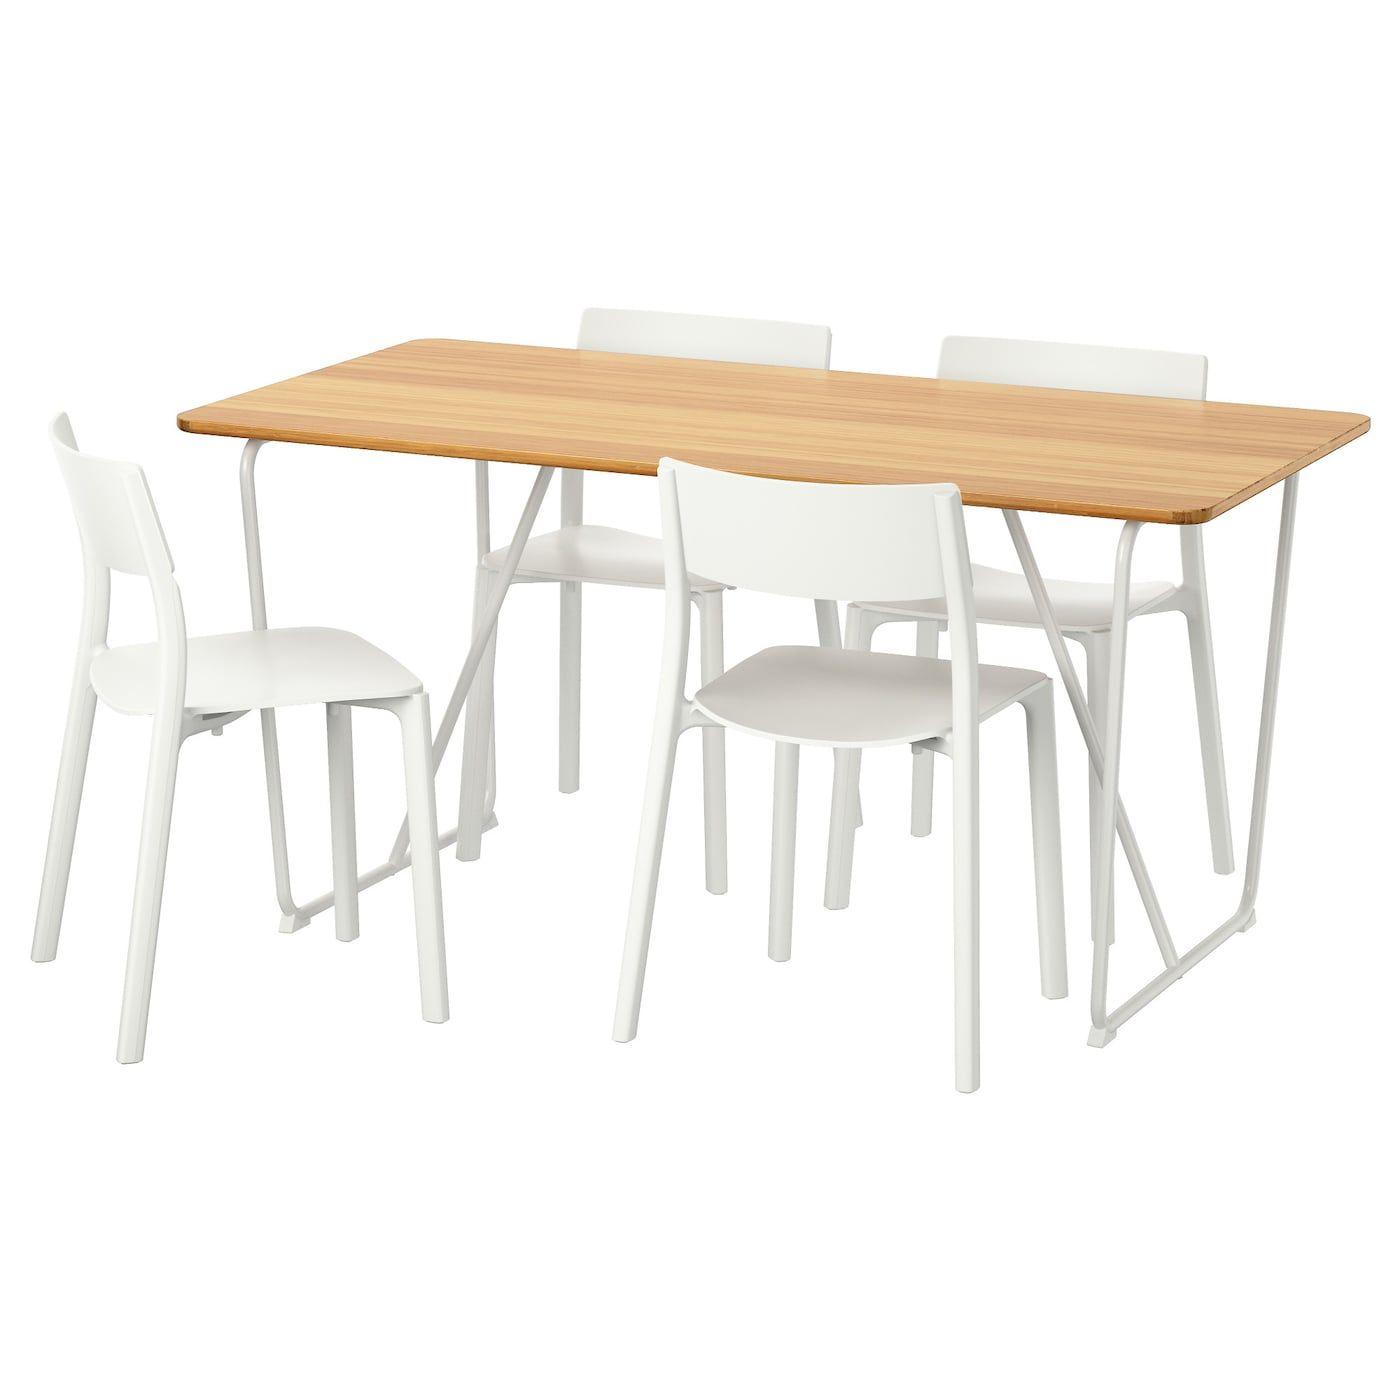 Ovraryd Janinge Mesa Con 4 Sillas Blanco Bambu Blanco Ikea Ikea Dining Ikea Dining Sets Ikea [ 1400 x 1400 Pixel ]